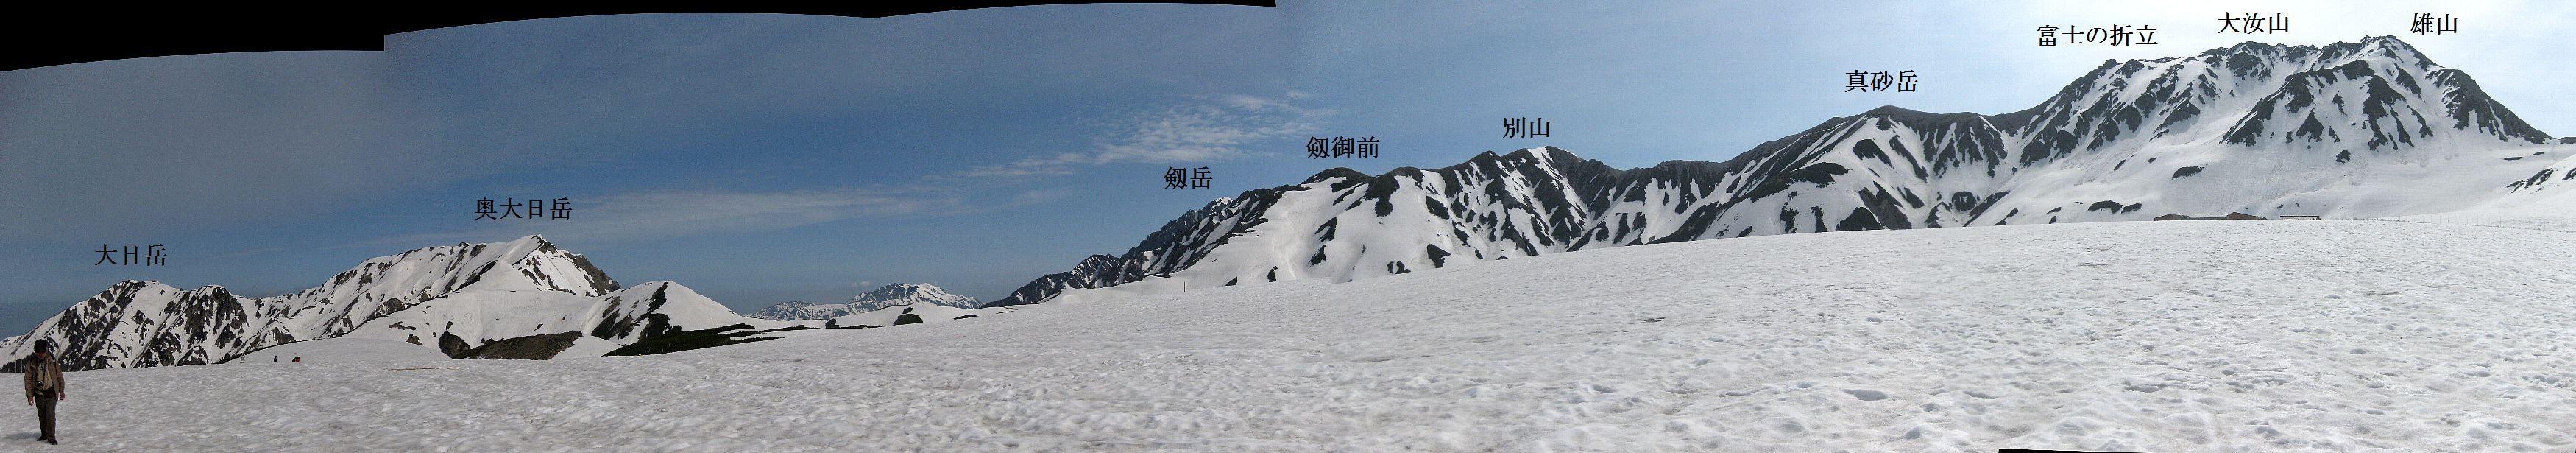 黒部・立山ツアー_a0138609_18304416.jpg